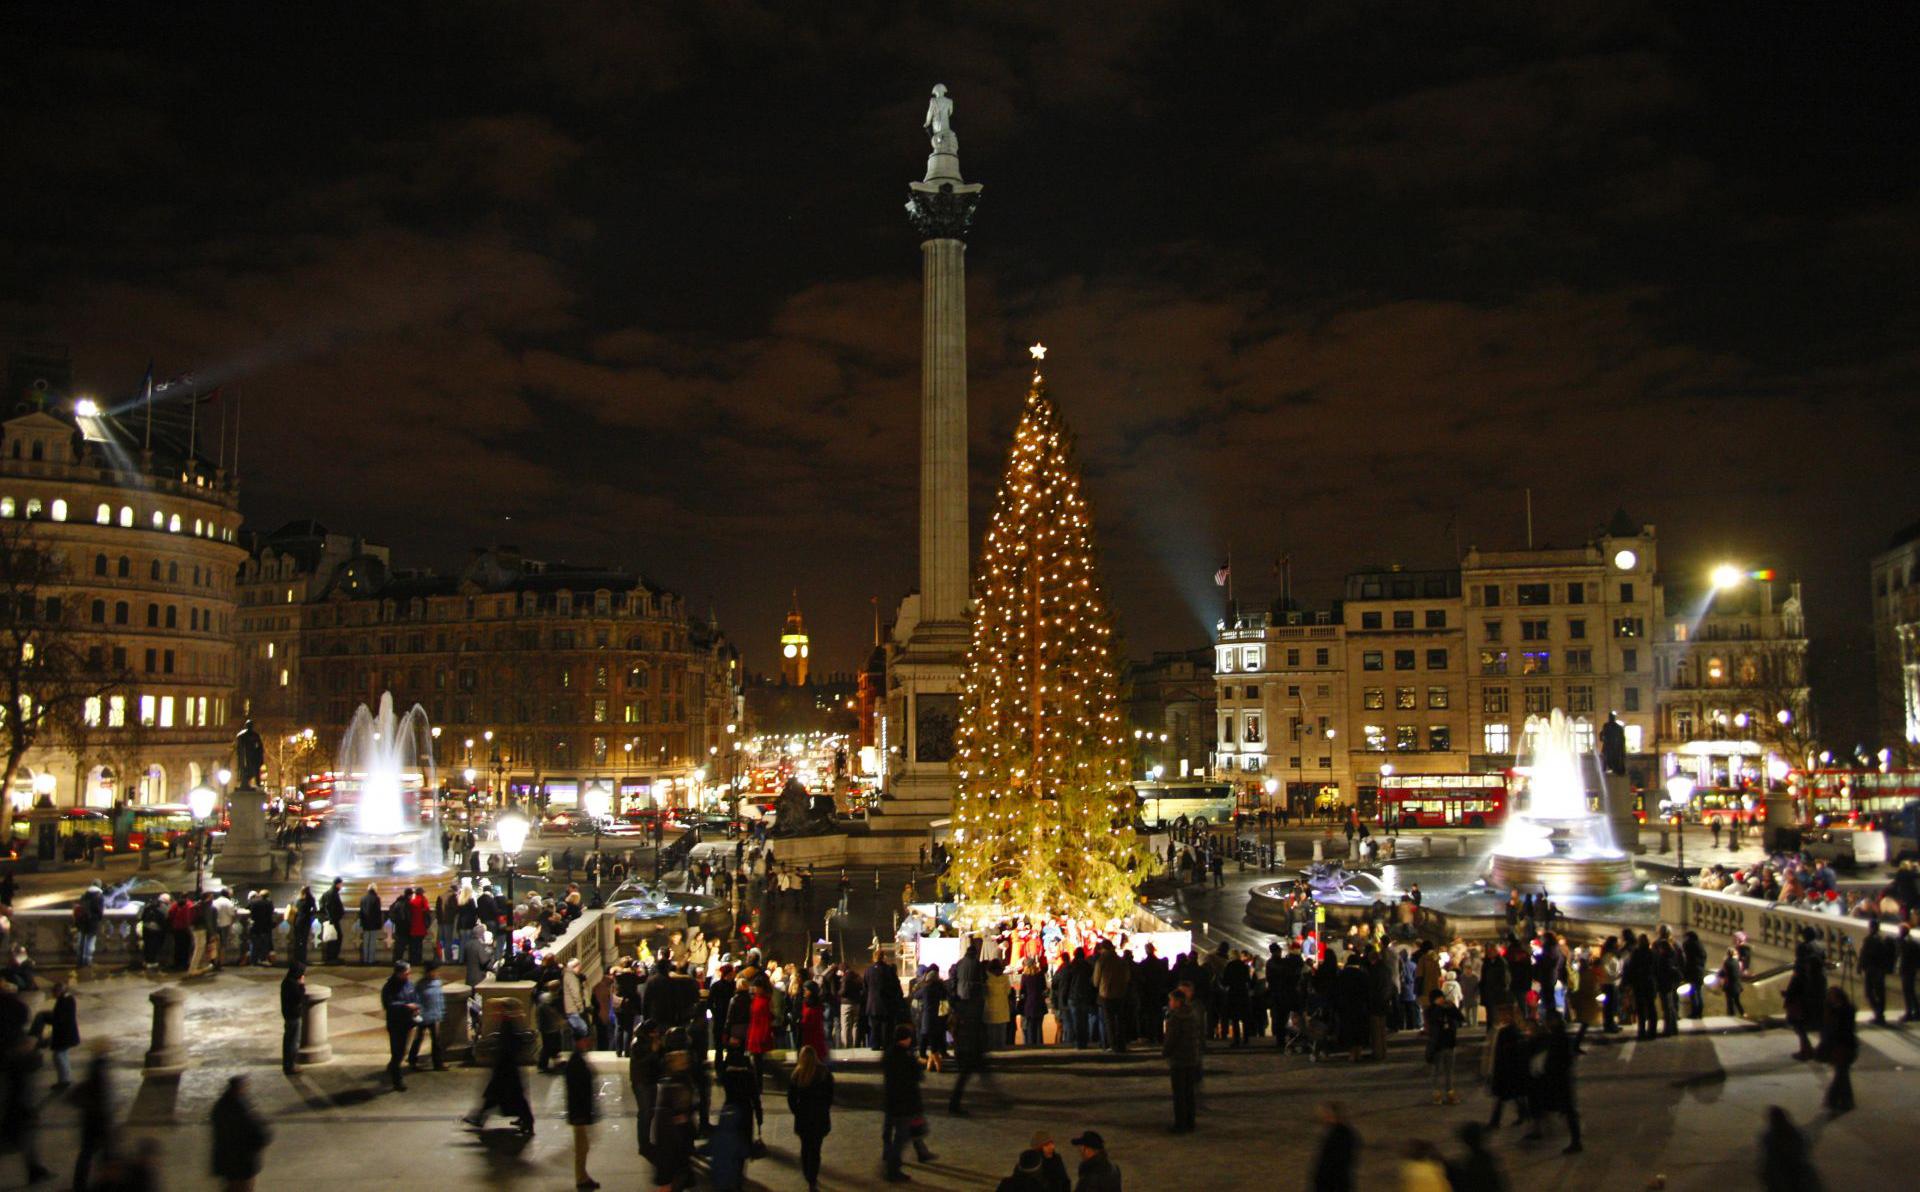 London's Christmas tree in Trafalgar Square